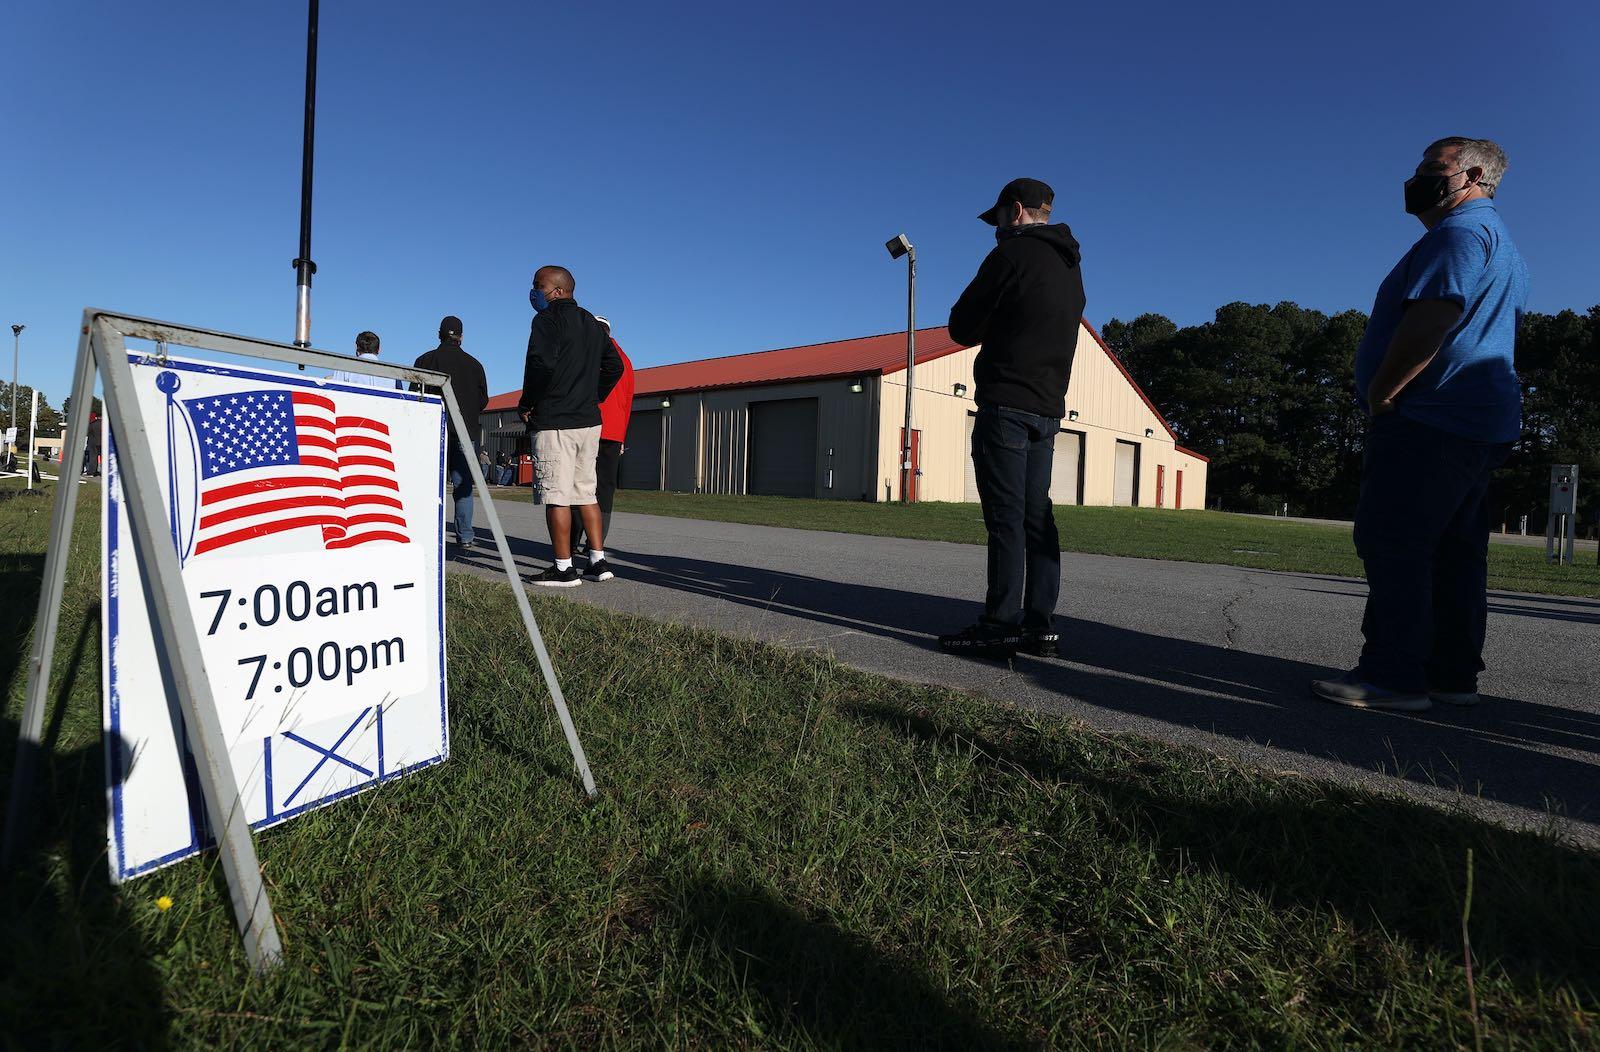 Voters waiting in line, Georgia, 2020